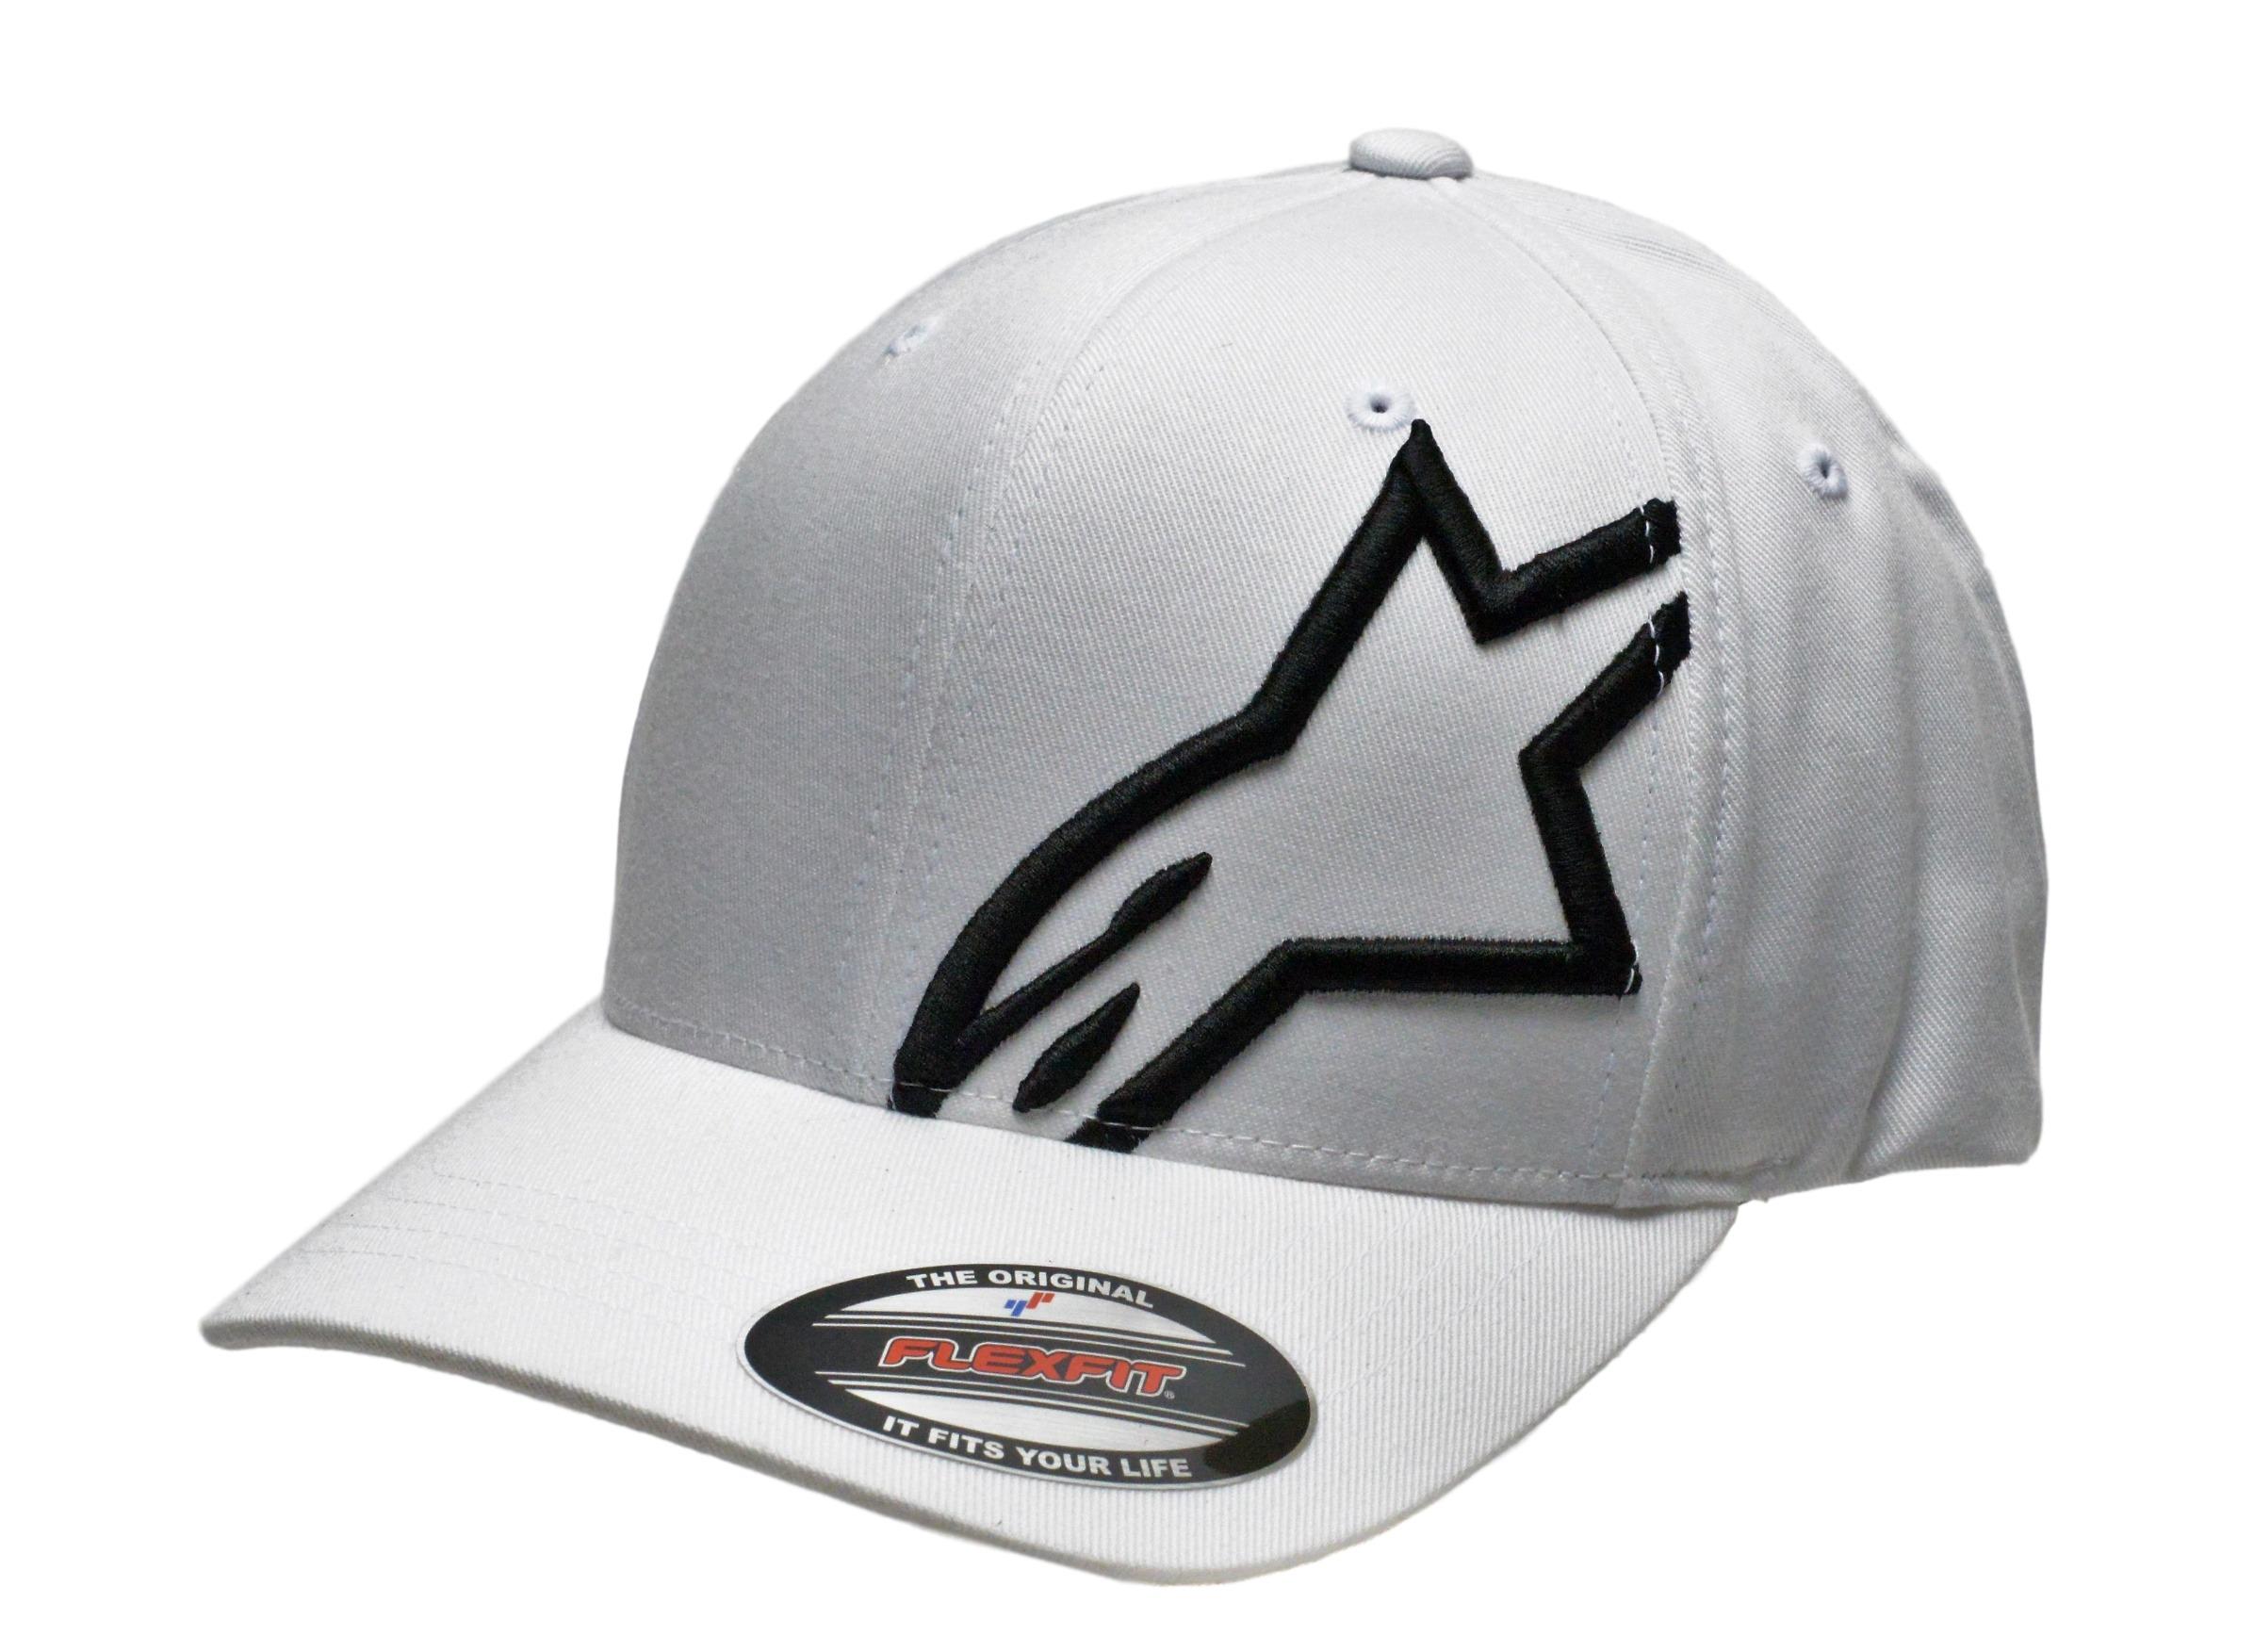 Alpinestars Corp Shift 2 Flexfit Hat White Black